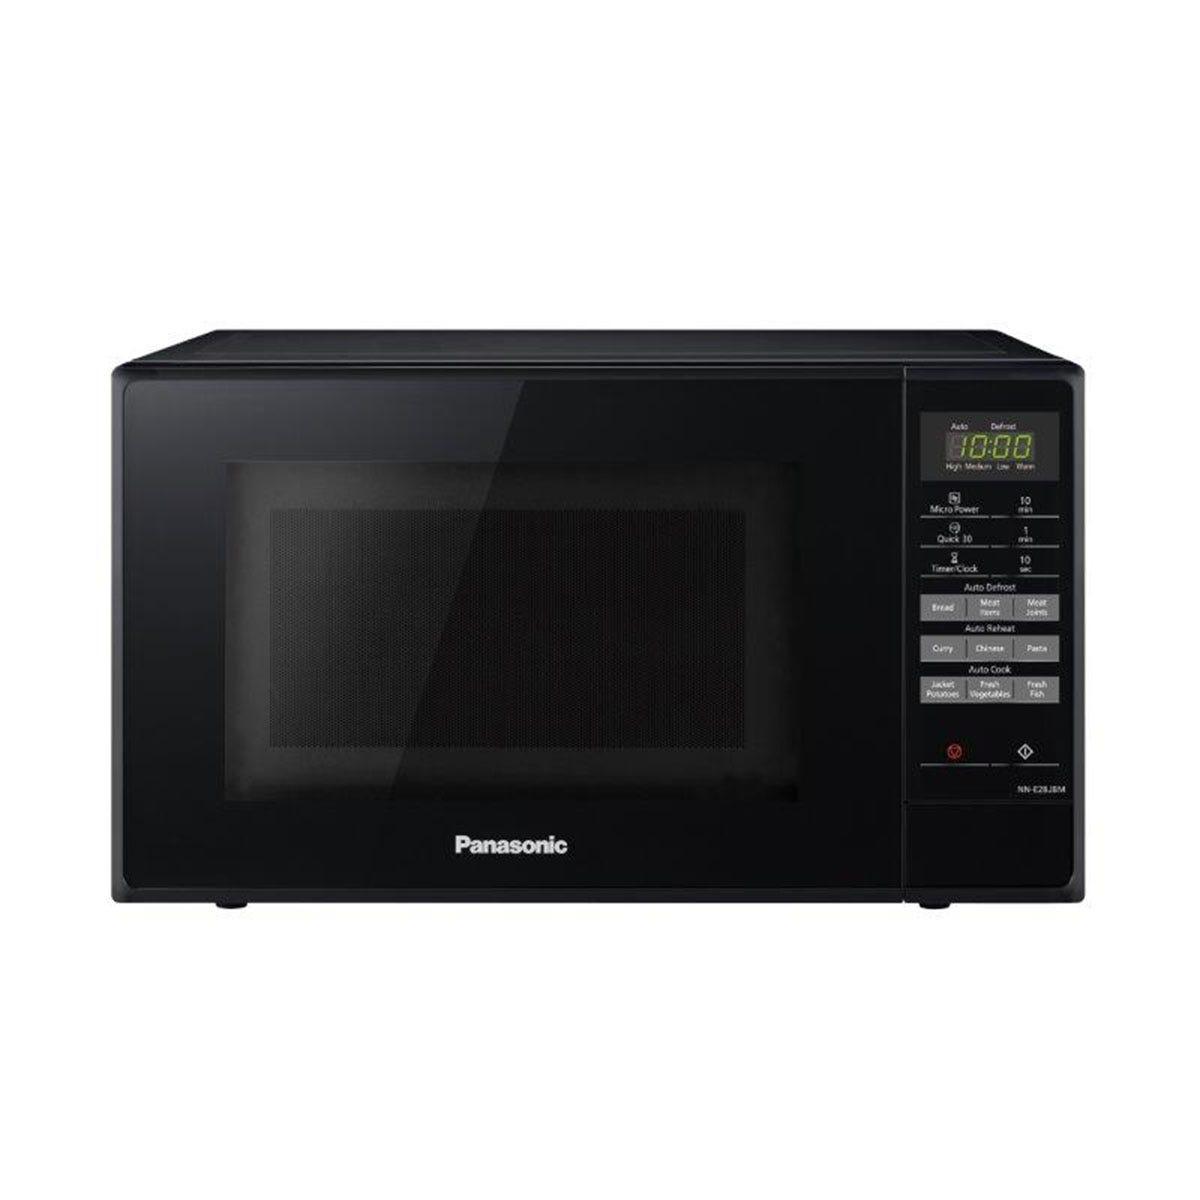 Panasonic NN-E28JBMBPQ 20L 800W Digital Microwave Oven - Black